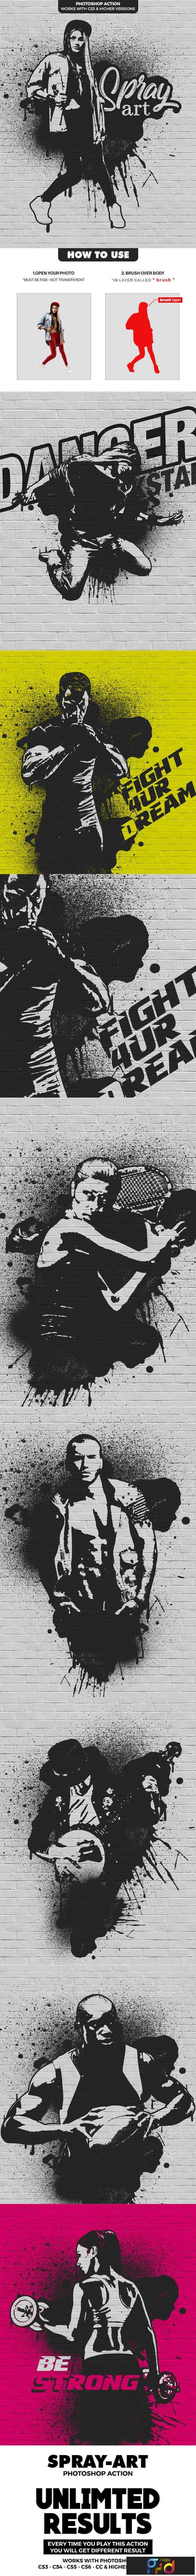 1806113 Spray Art Photoshop Action 21885362 1